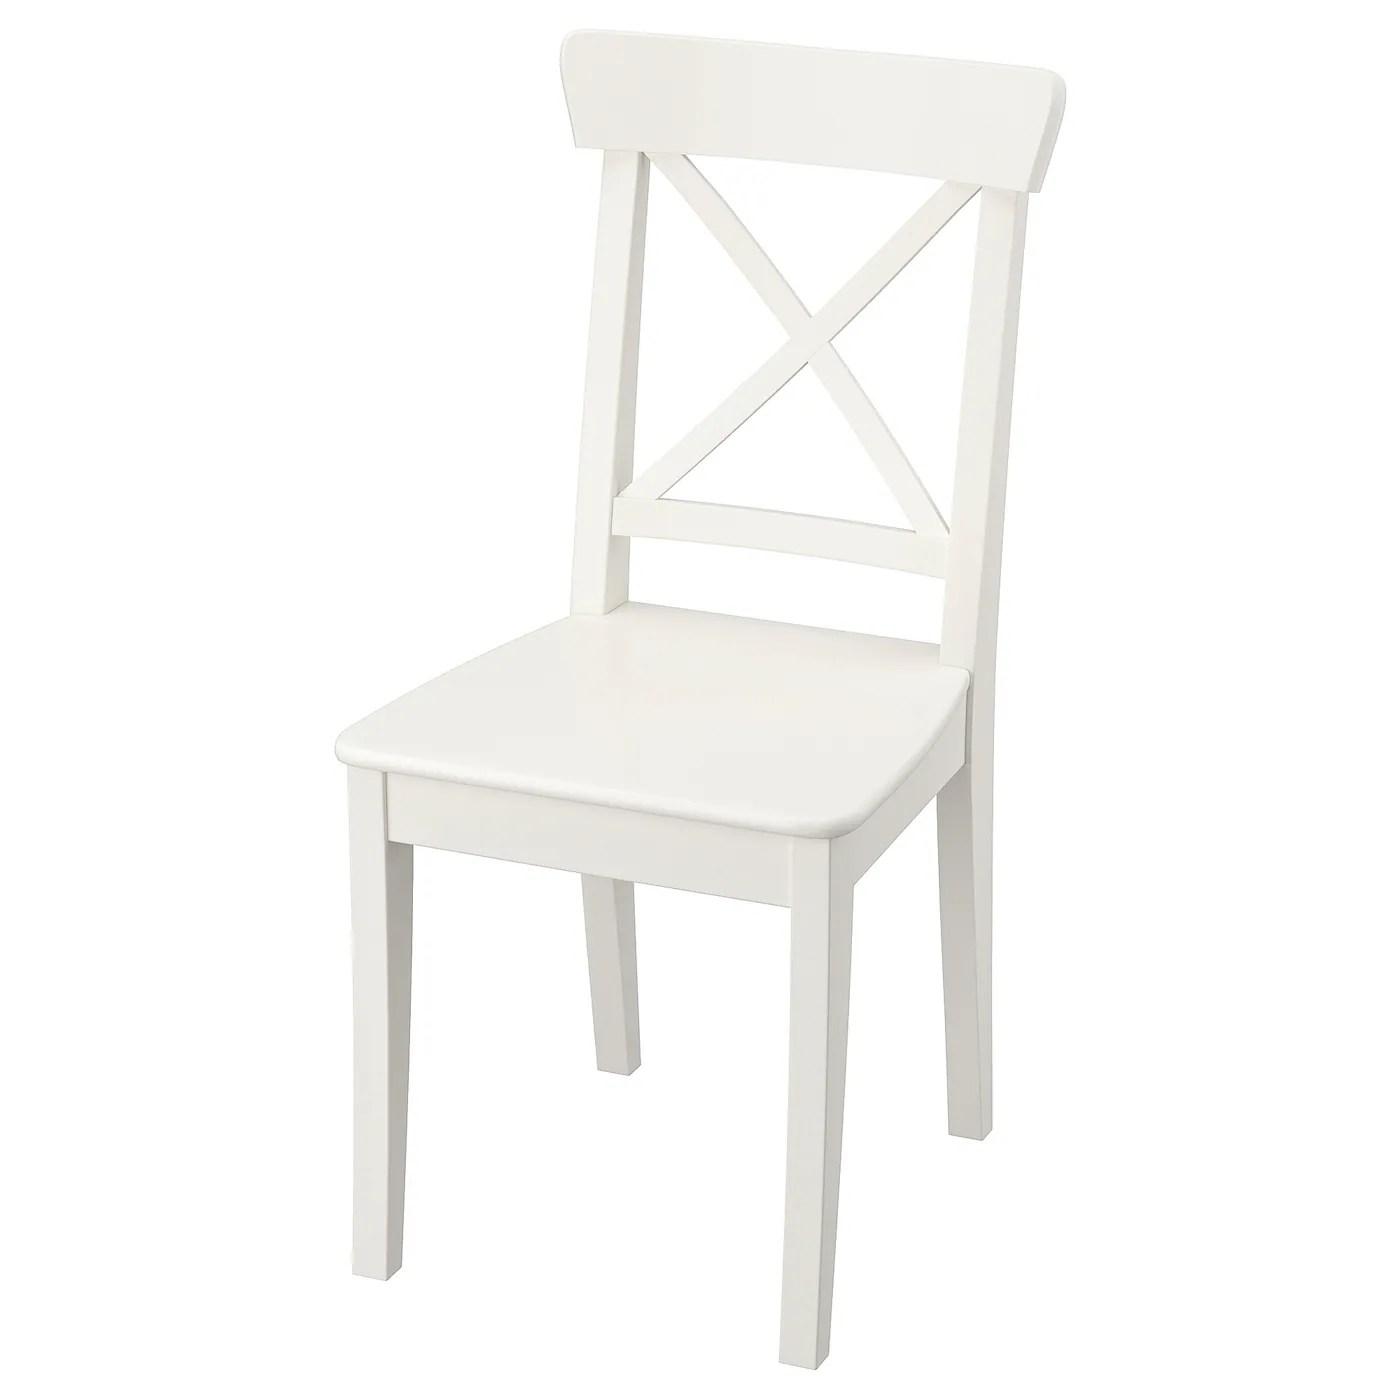 130 € | tavolo da cucina. Ingolf Sedia Bianco Ikea It